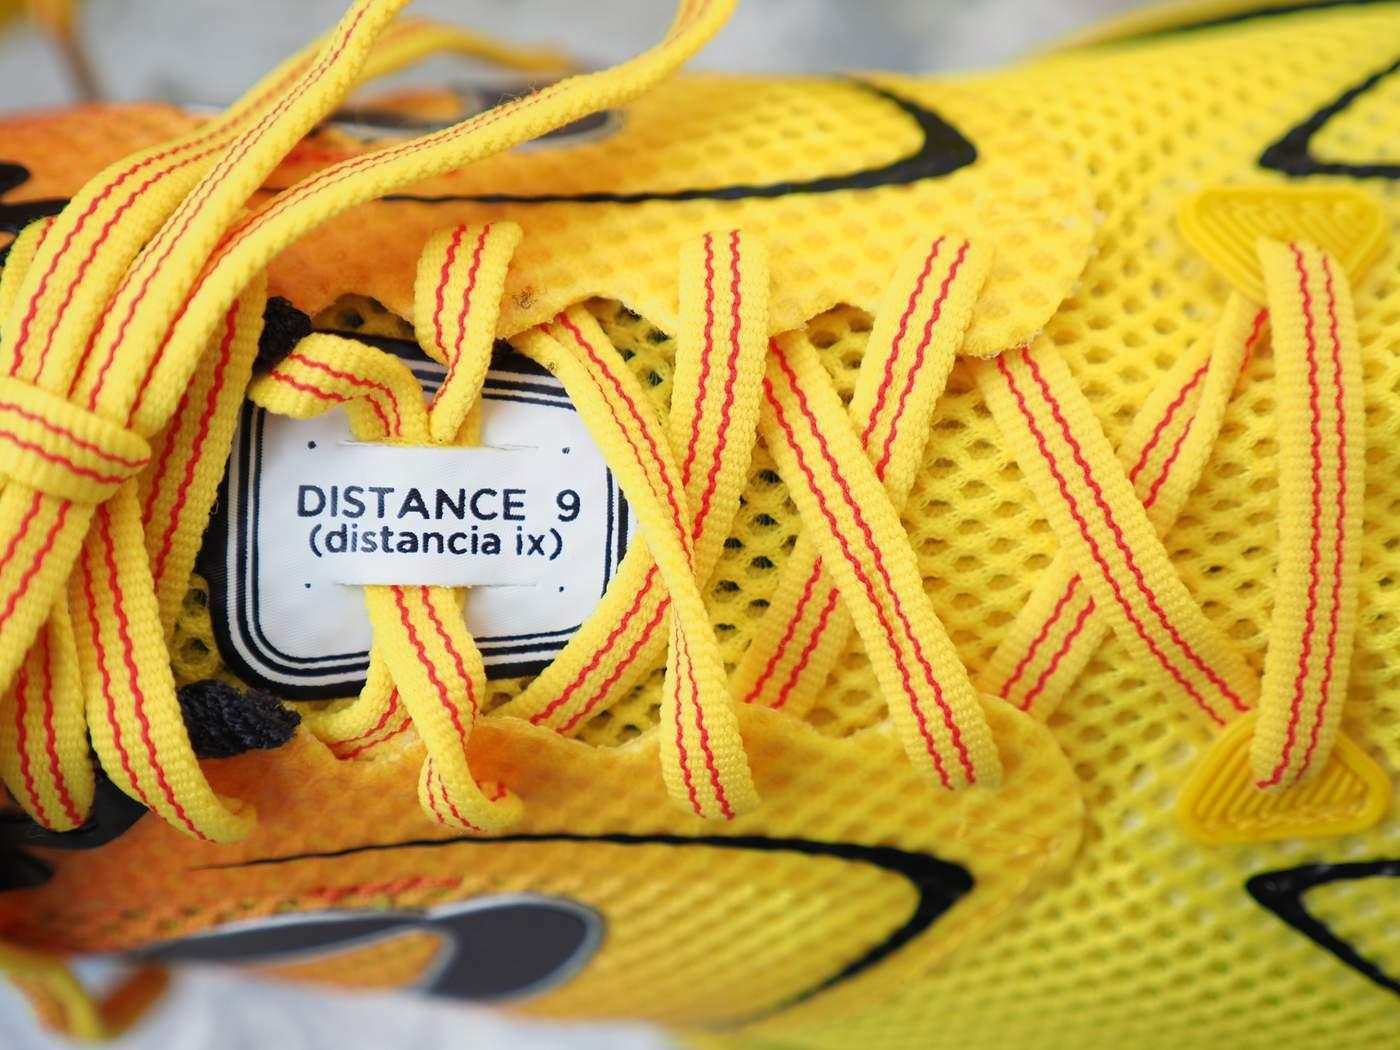 Distance 9